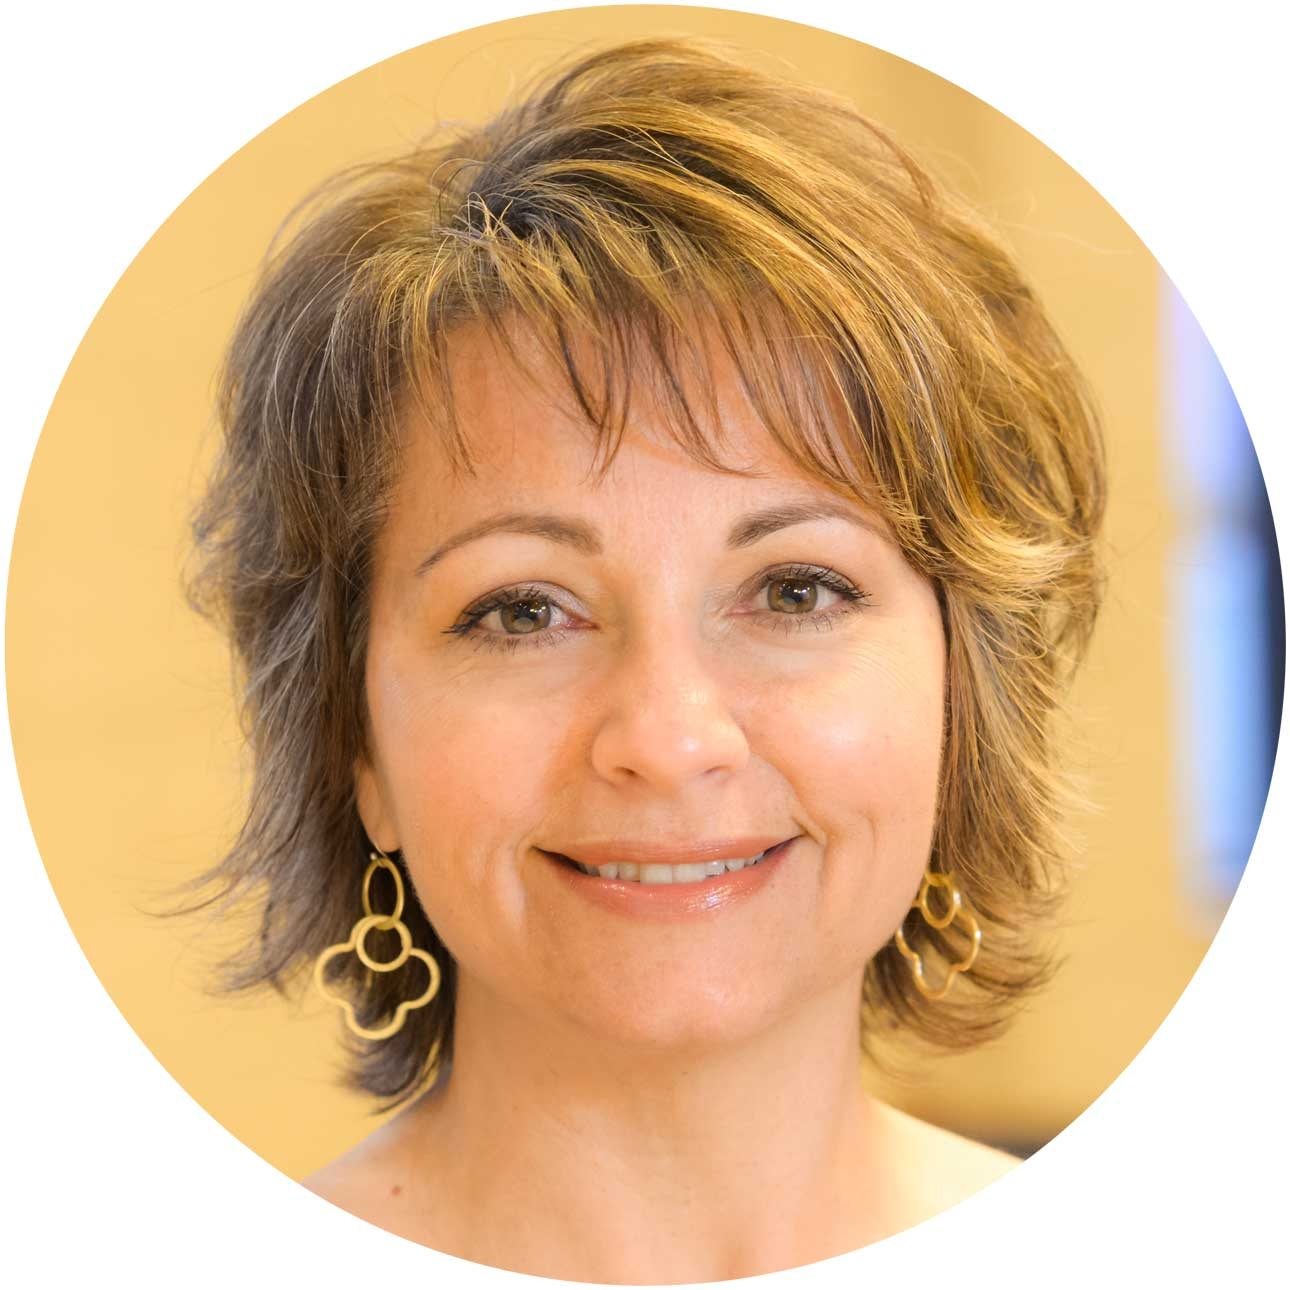 <h2>Lisa Whitaker</h2><br>Music Ministry Assistant<p>lisa@stjohnlutheran.org</p>